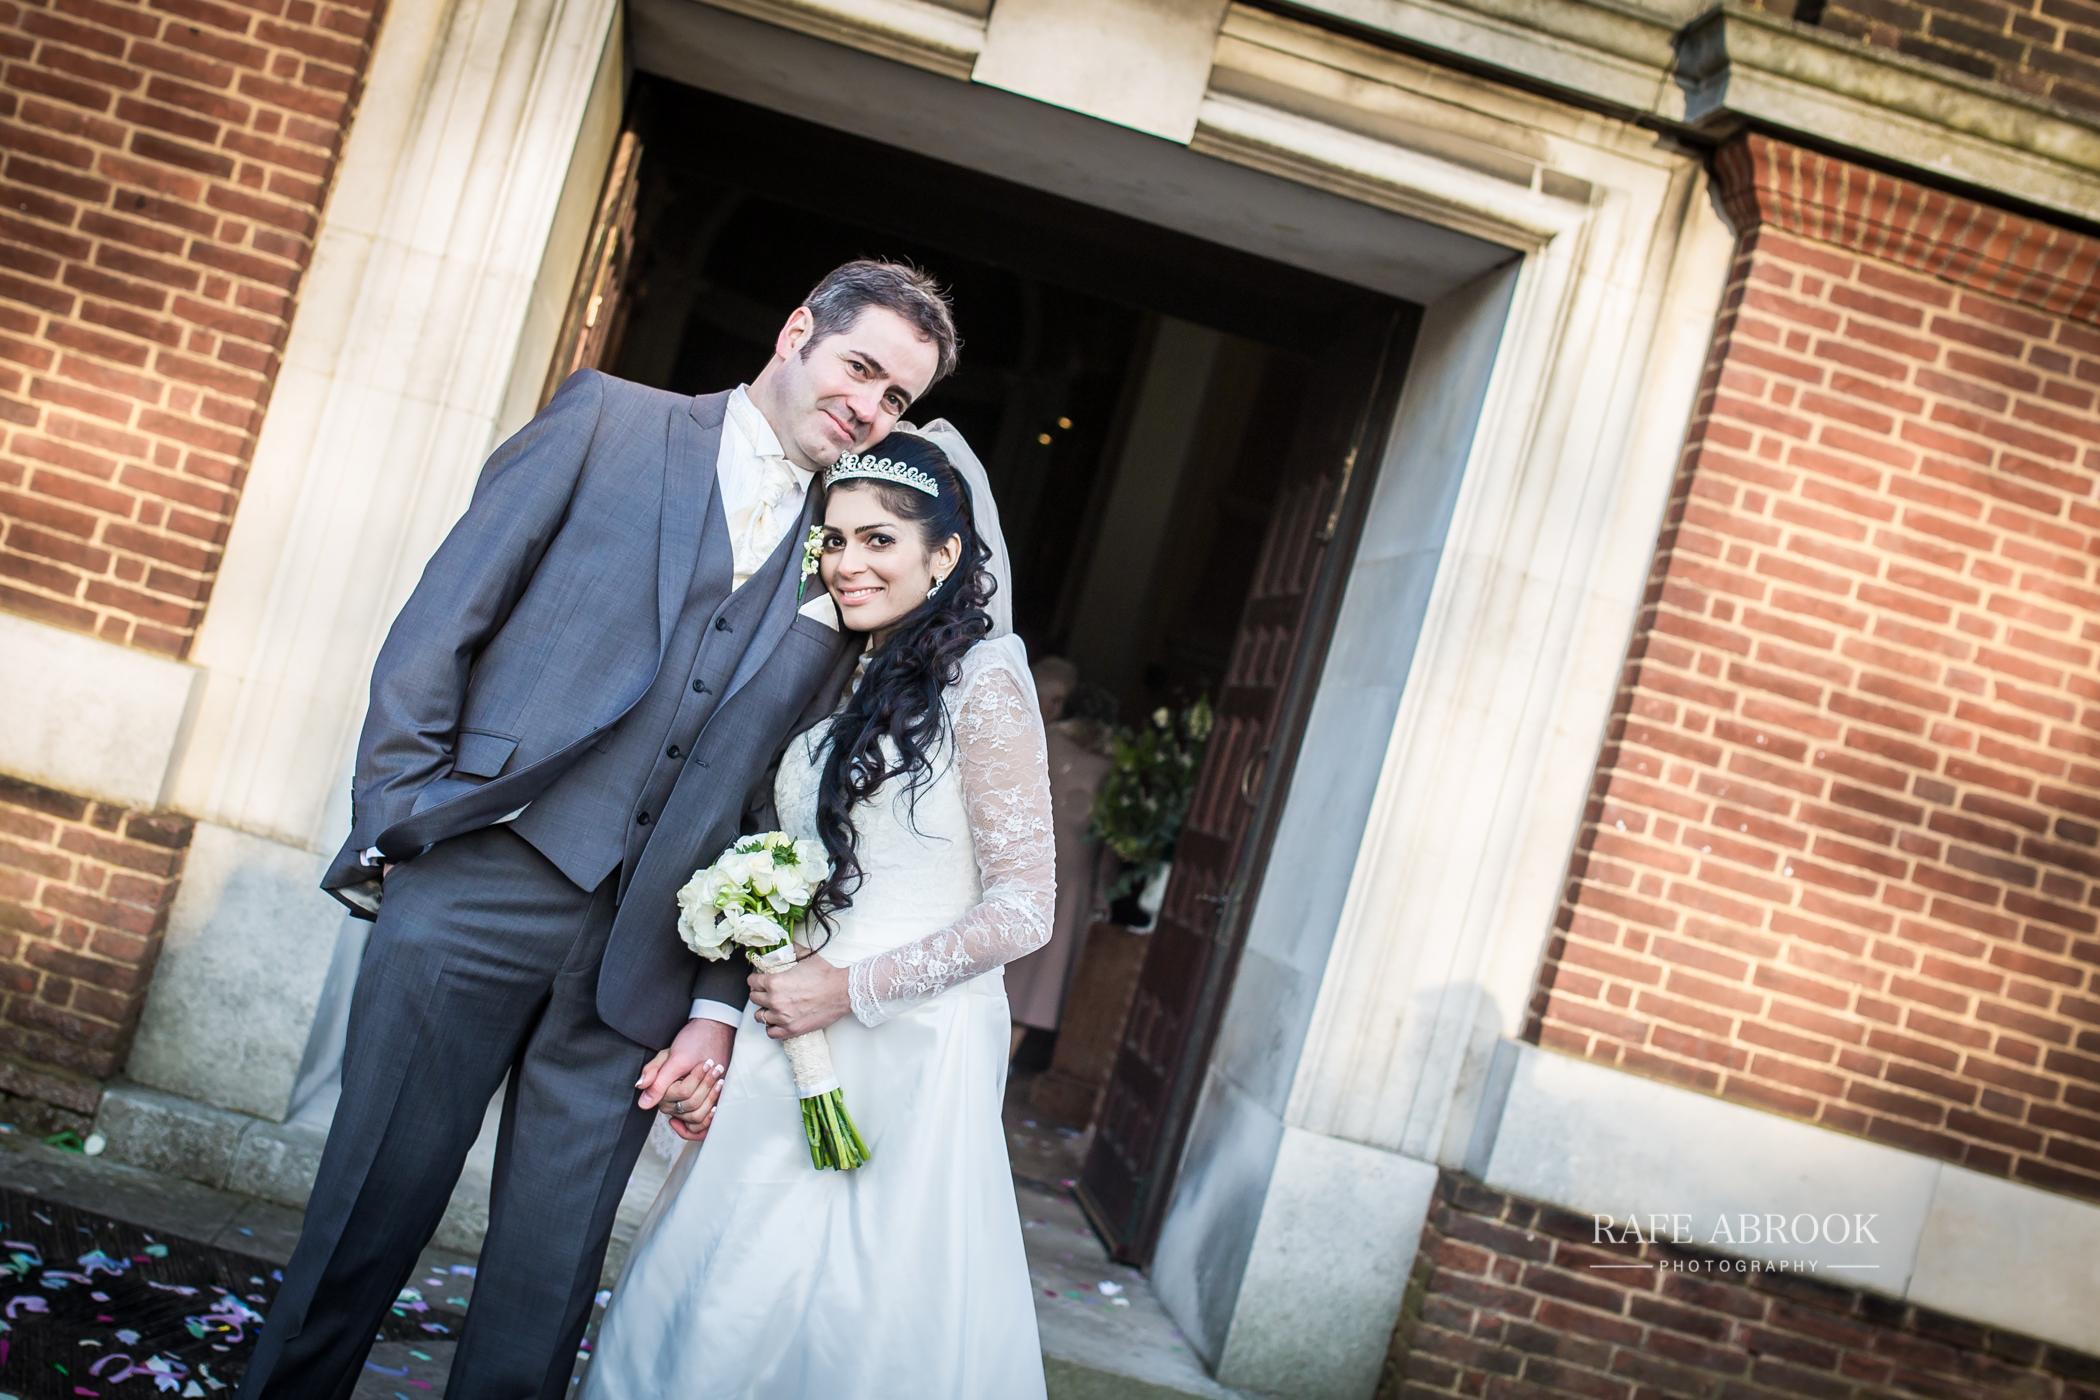 roma & pete wedding hampstead shenley hertfordshire -274.jpg